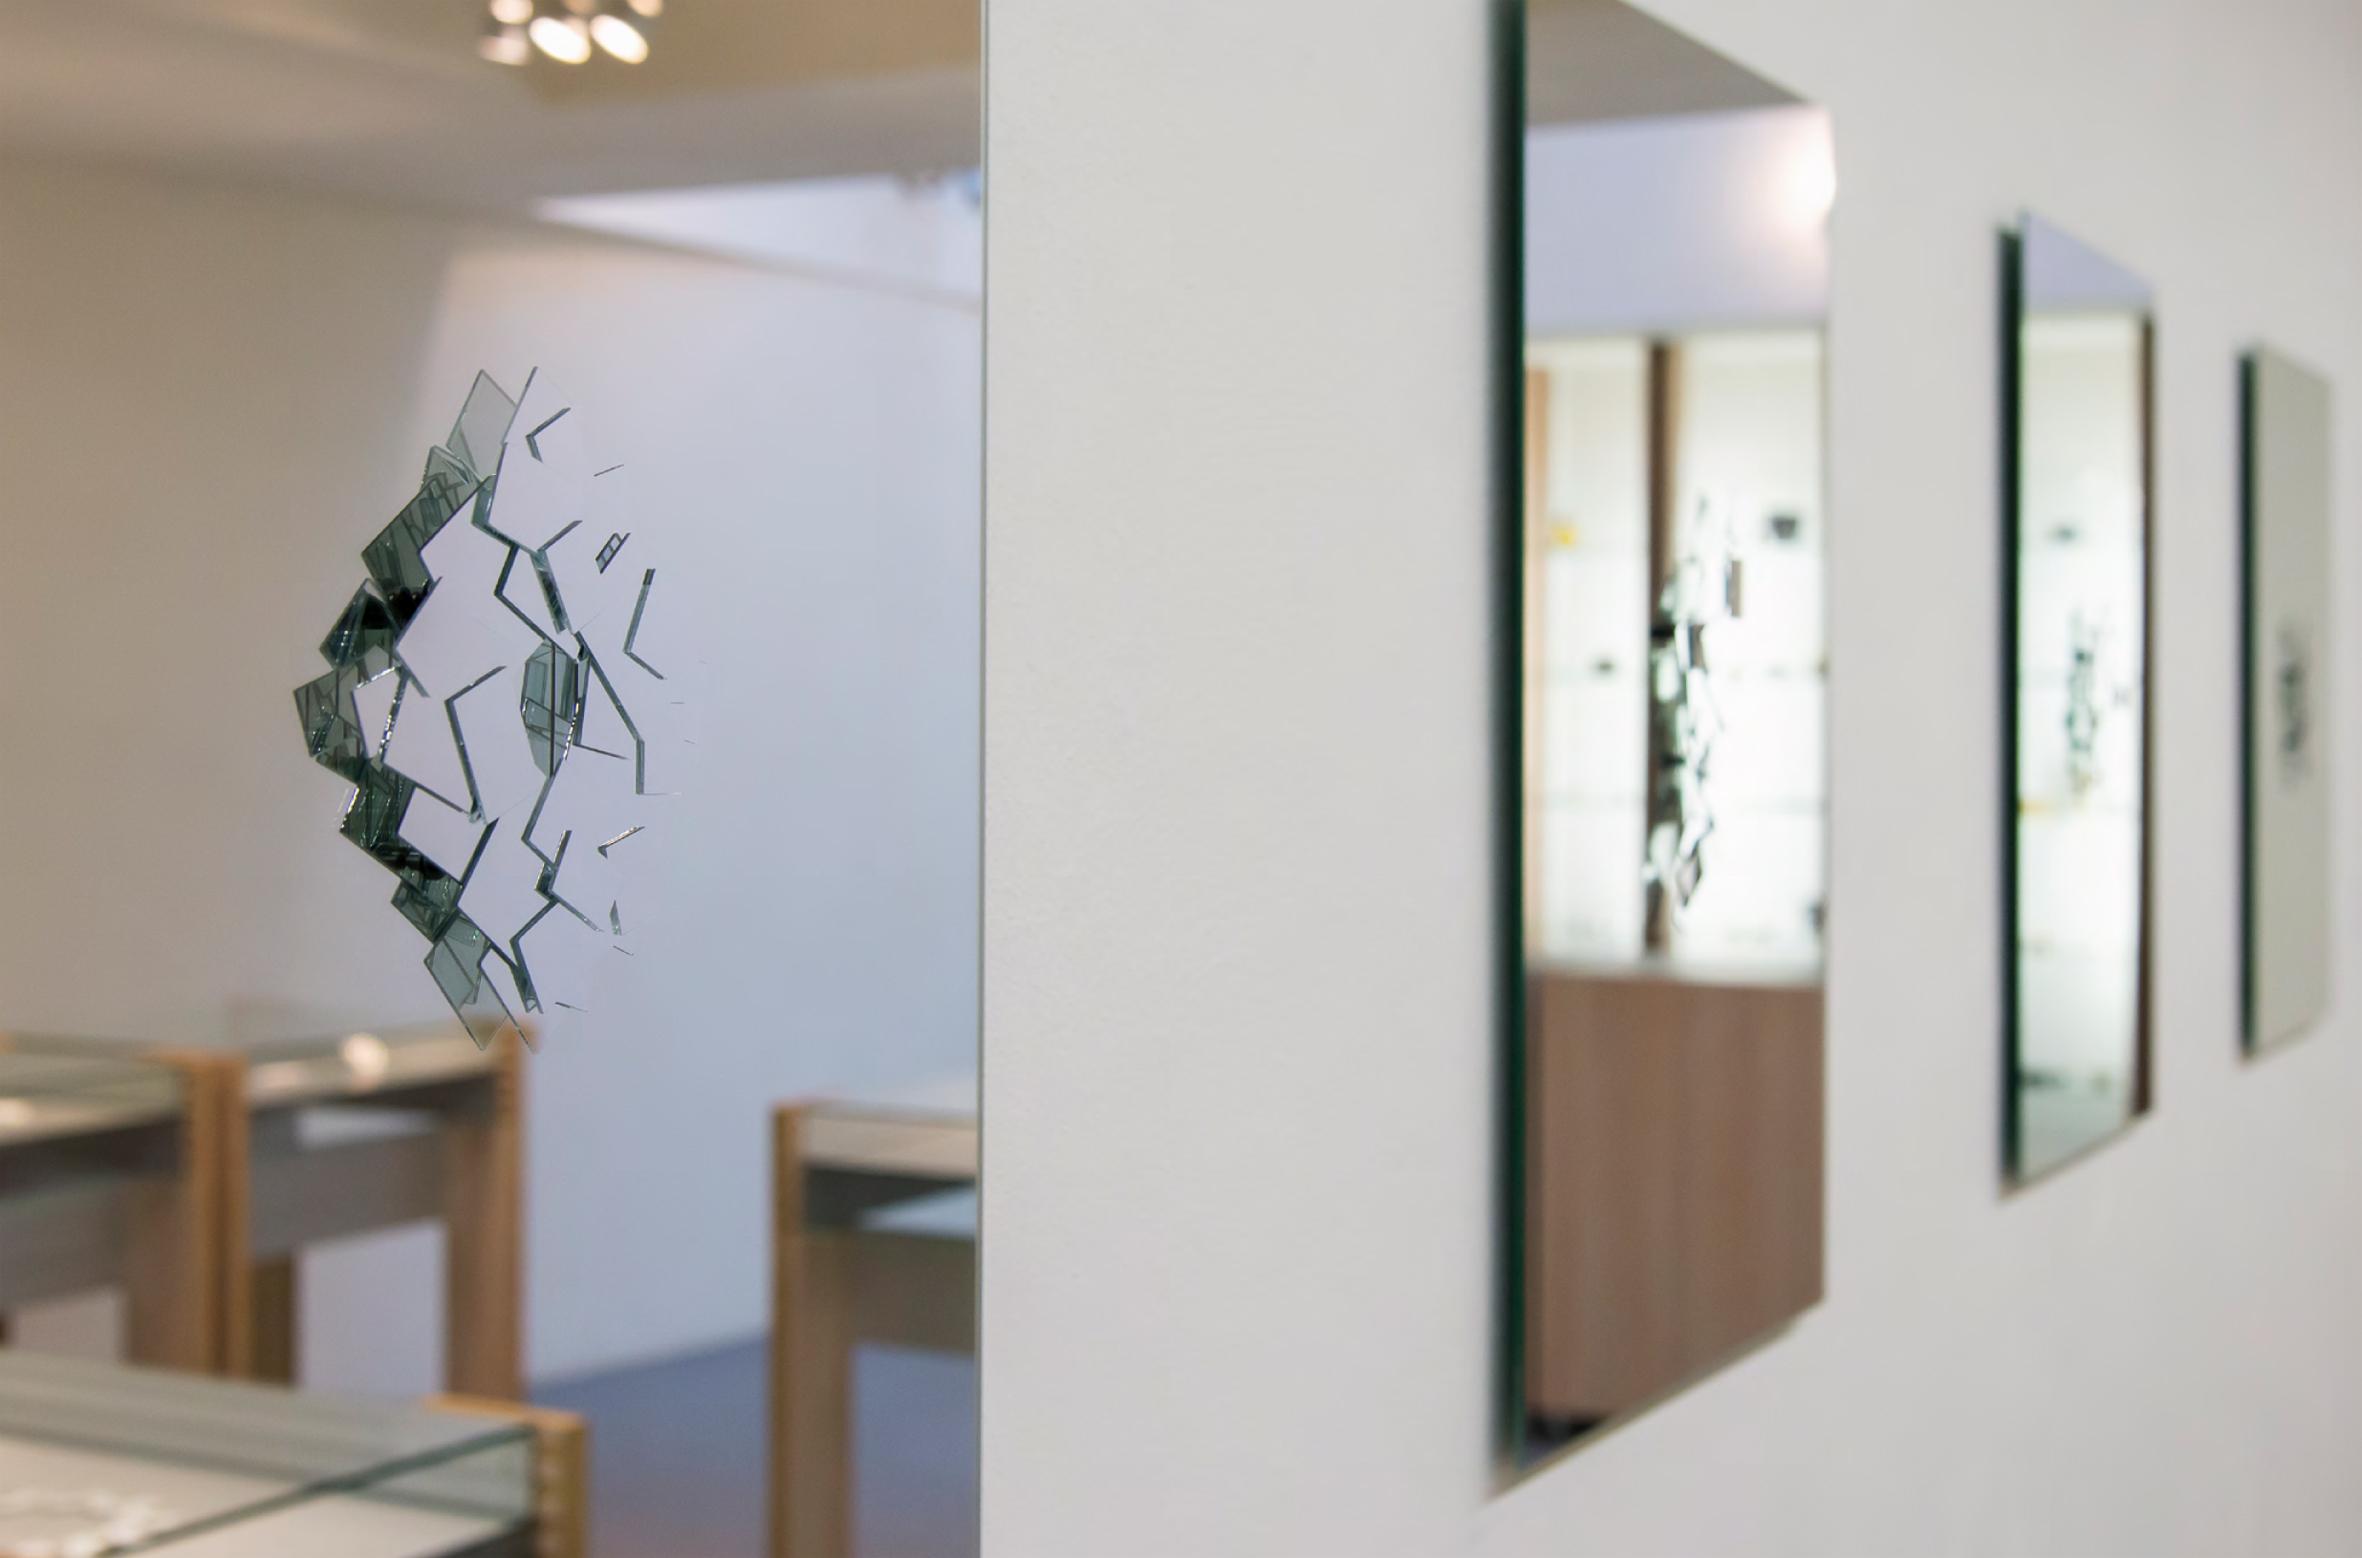 Jiro Kamata in Galerie Rob Koudijs, 2016, tentoonstelling